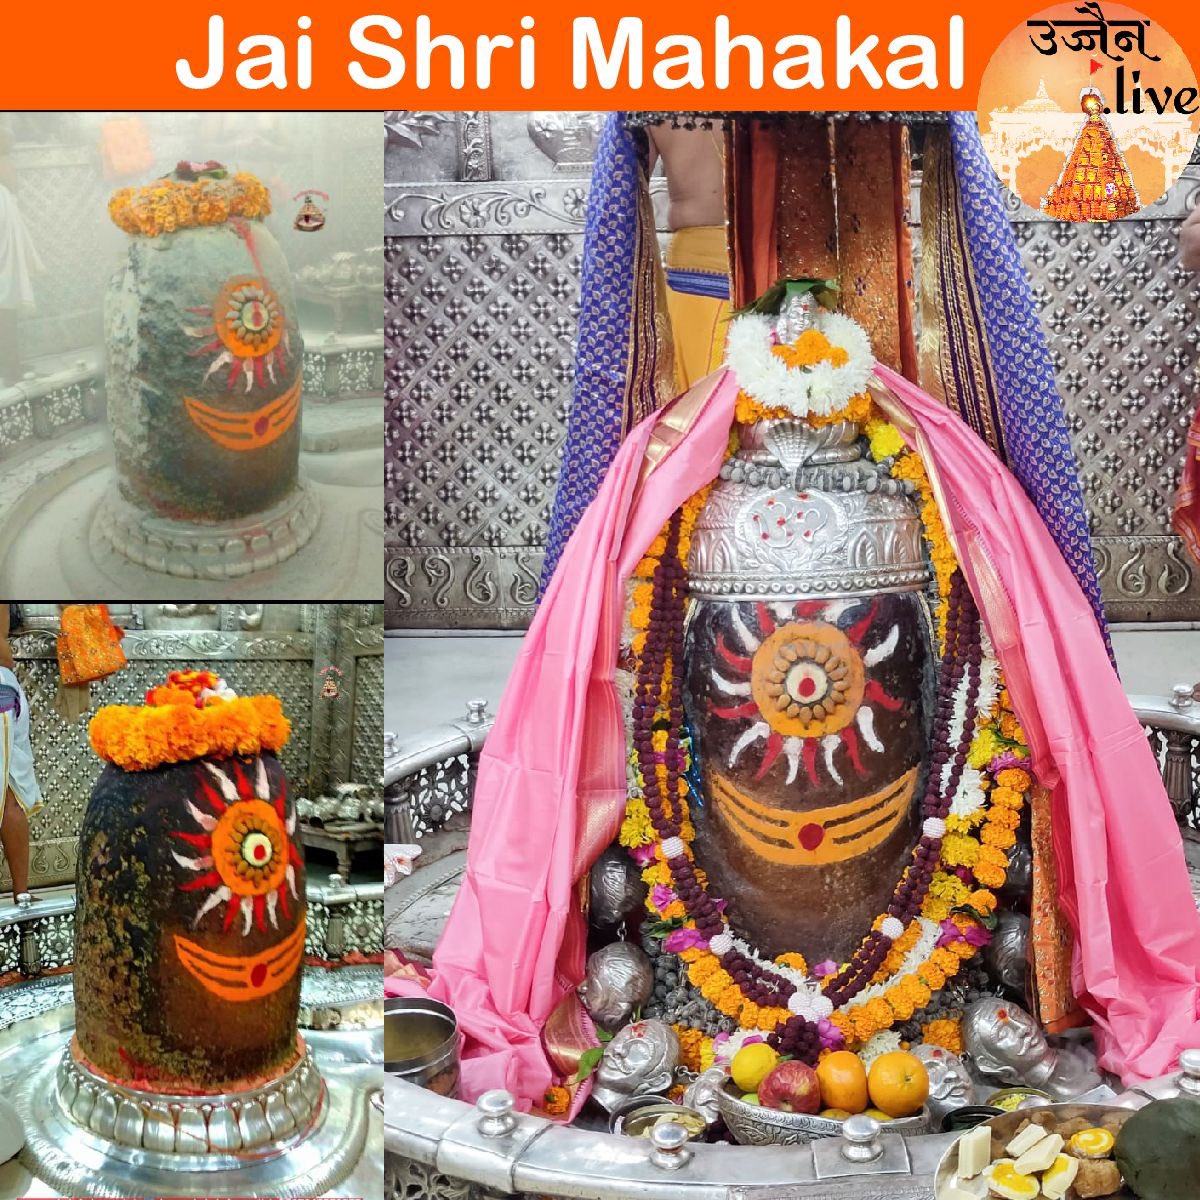 Dec 6: Bhasma Aarti darshan of Shree #Mahakaleshwar #Ujjain #shiv #shiva #bholenath #mahadev #हर_हर_महादेव #jaibholenath #jaimahakal #om #omnamahshivay #harharmahadev  #mahakal #goodmorning #sundayvibes #Incredibleindia  @HinduTempleLive @BharatTemples_